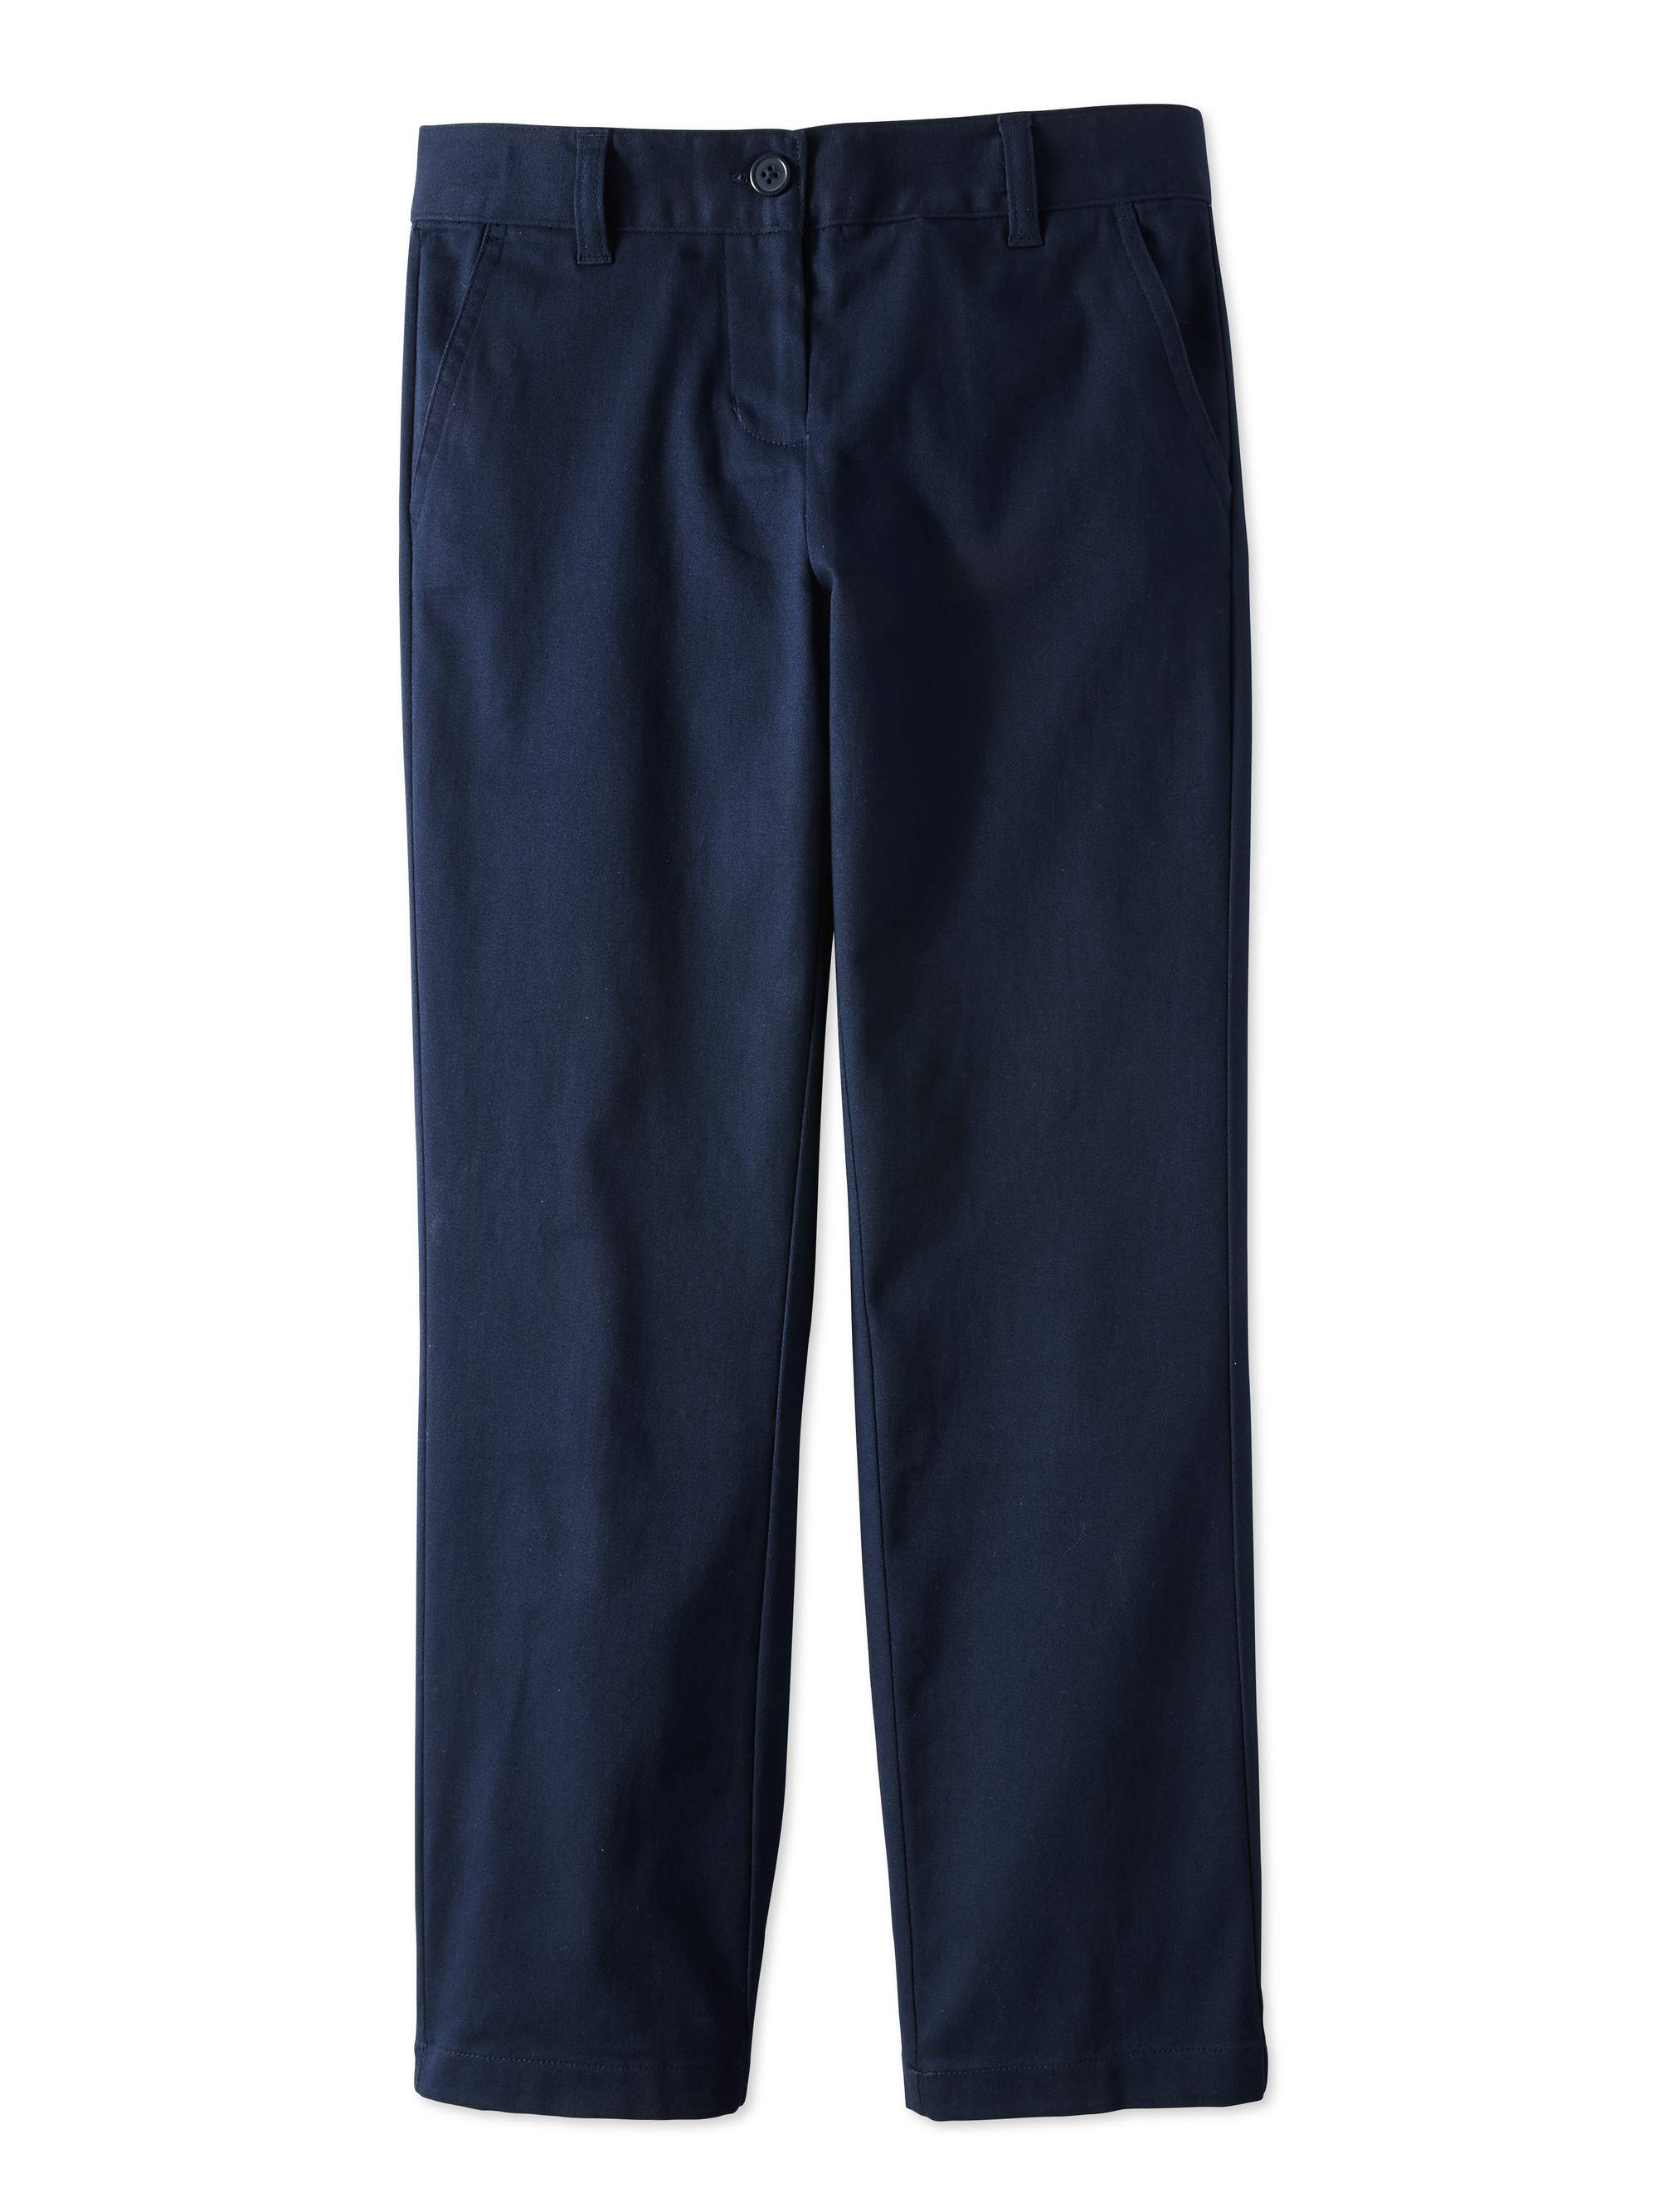 Girls Plus School Uniform Stretch Twill Straight Fit Pants